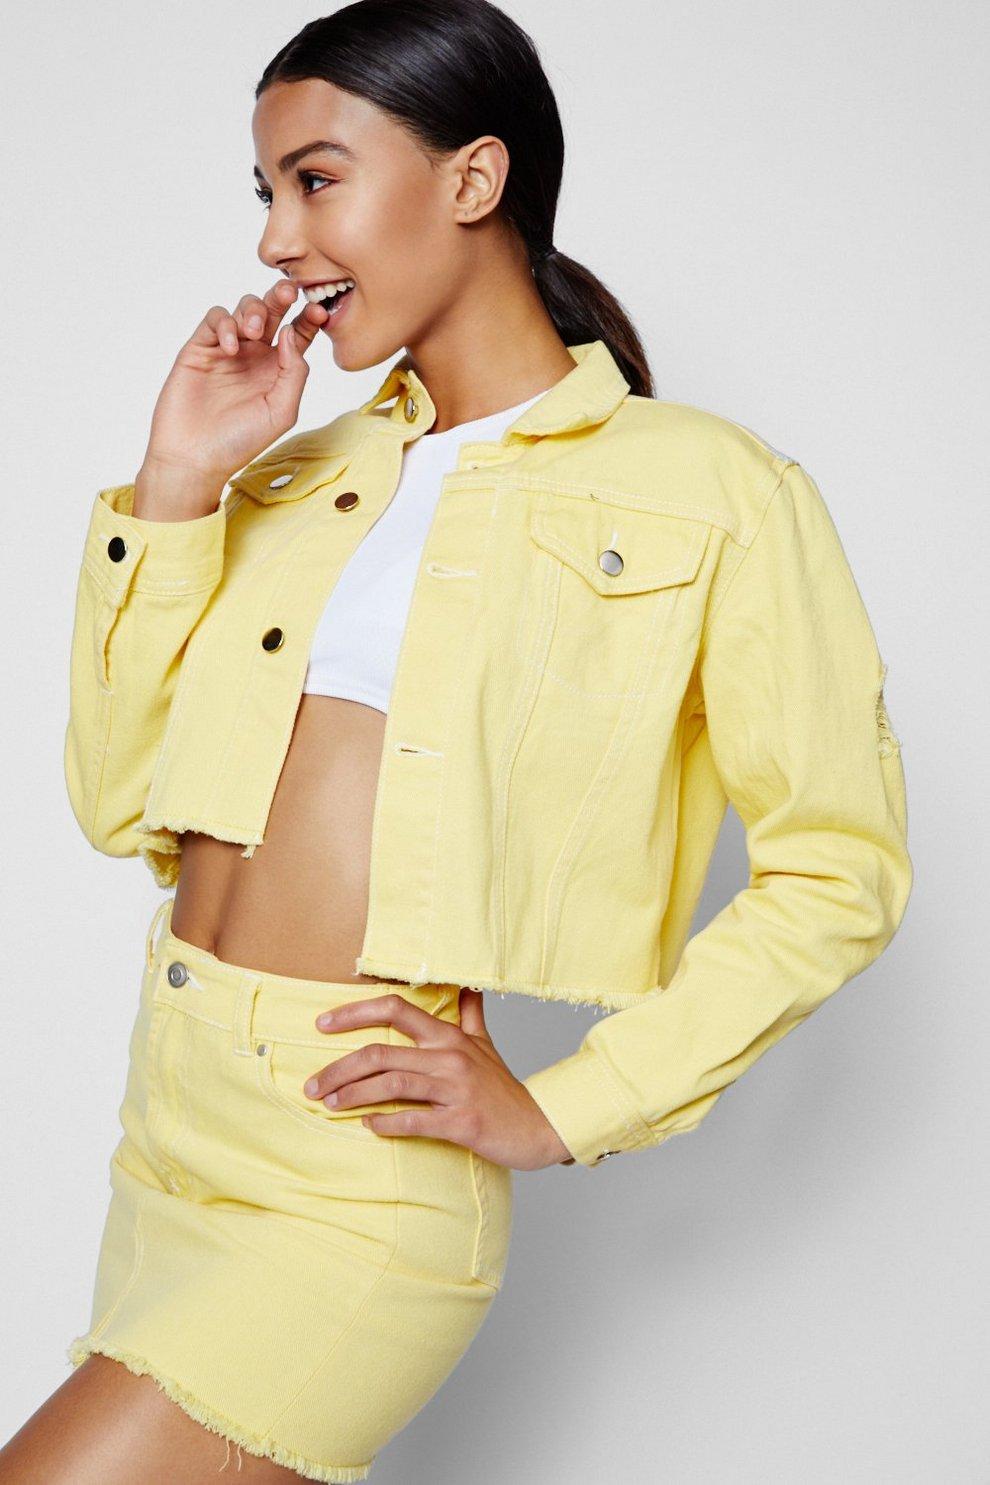 Boohoo Contrast Stitch Cropped Denim Jacket Wiki Cheap Online LuQt8Dt